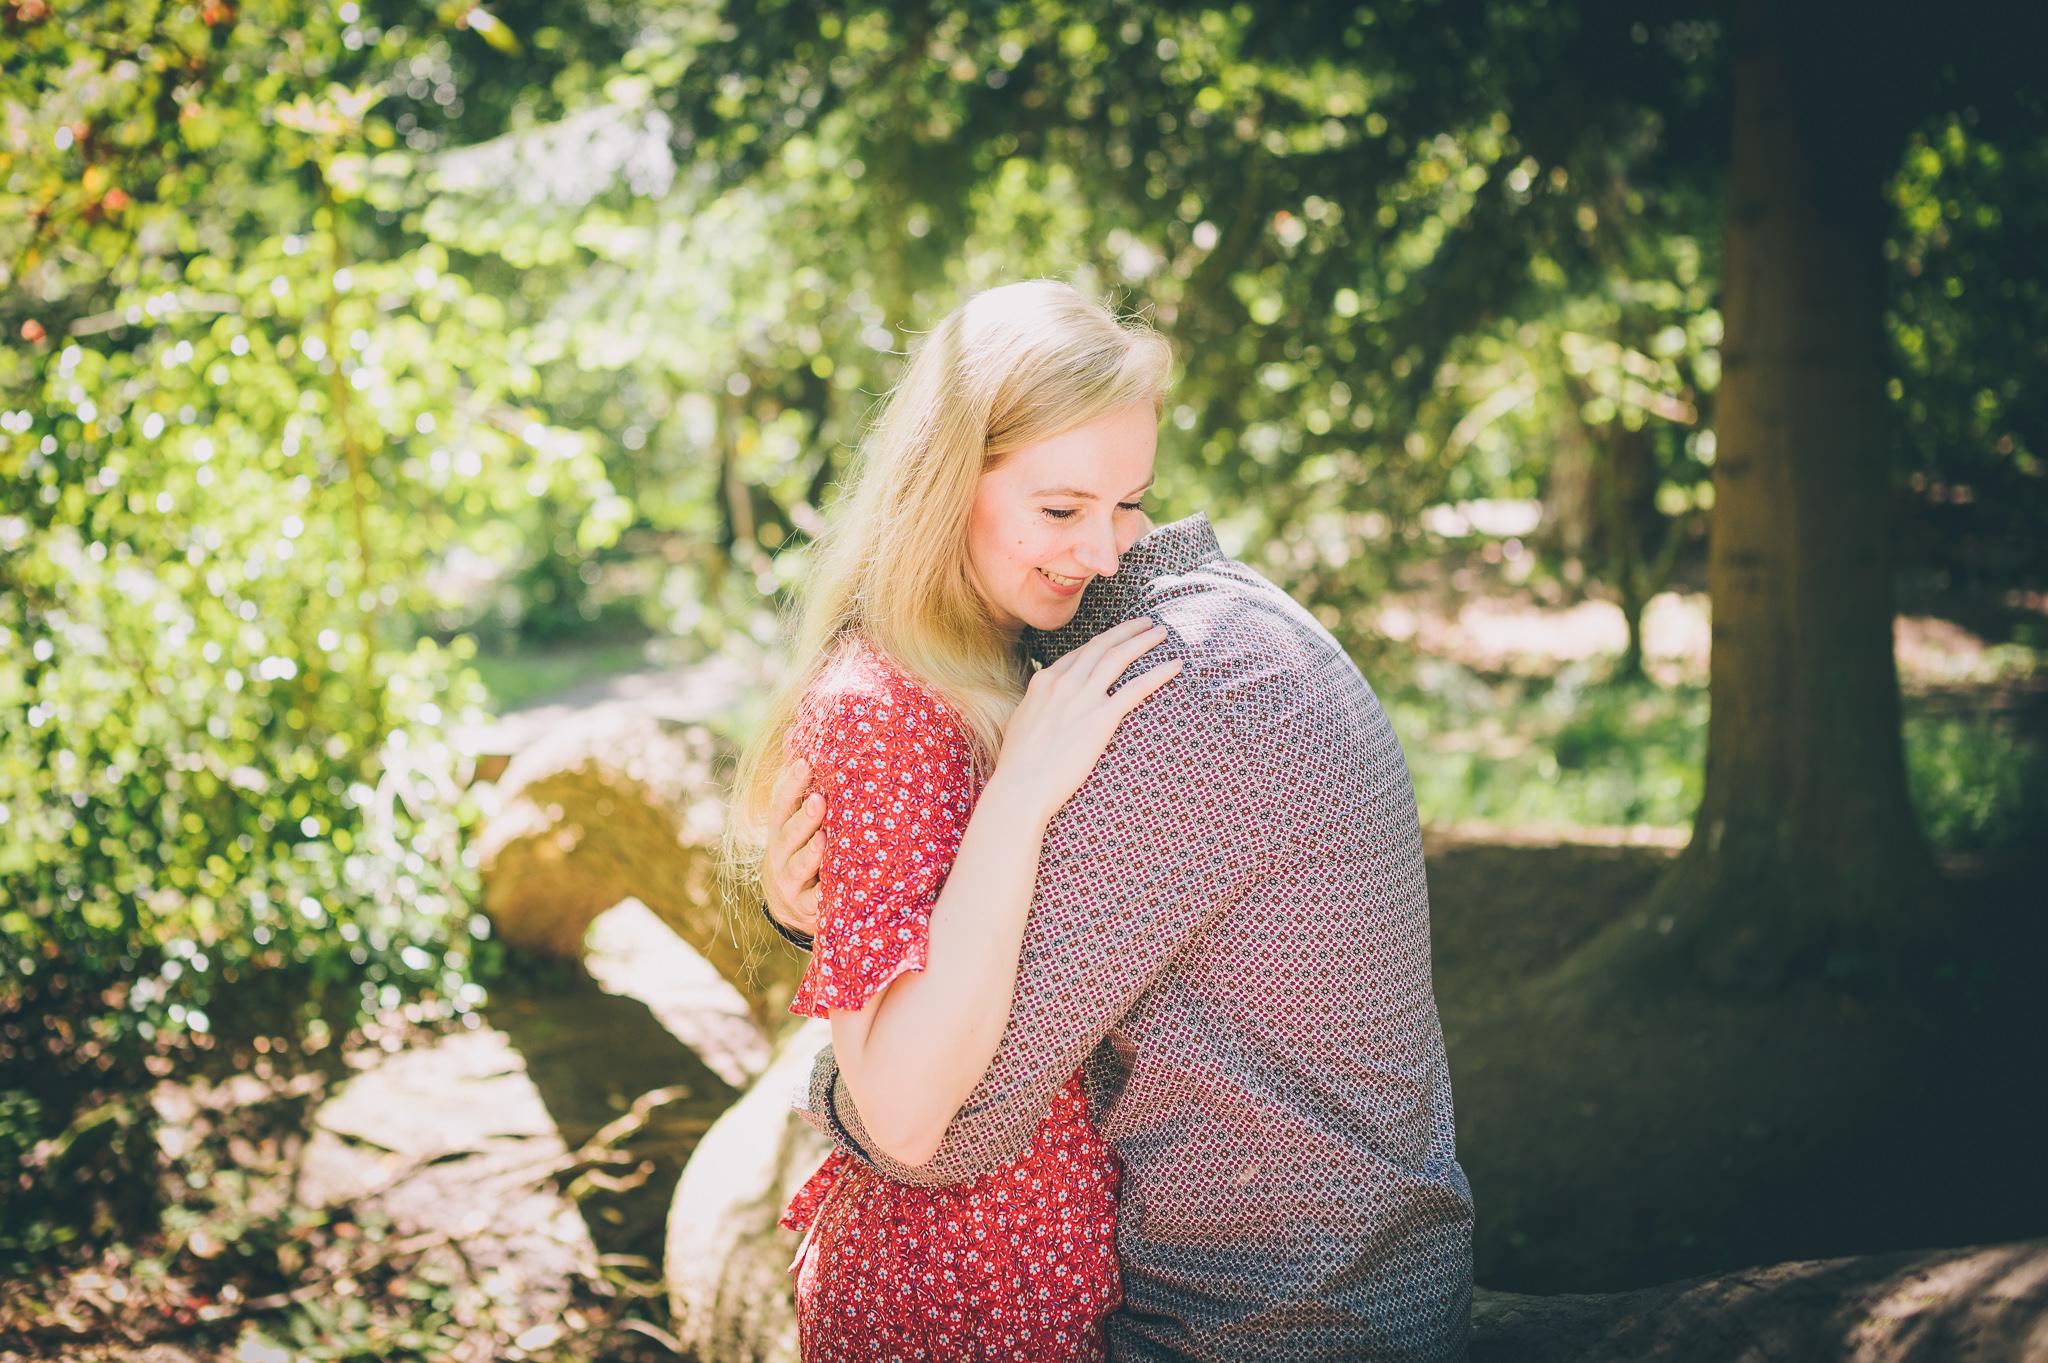 Engagement Photos at Clyne Gardens